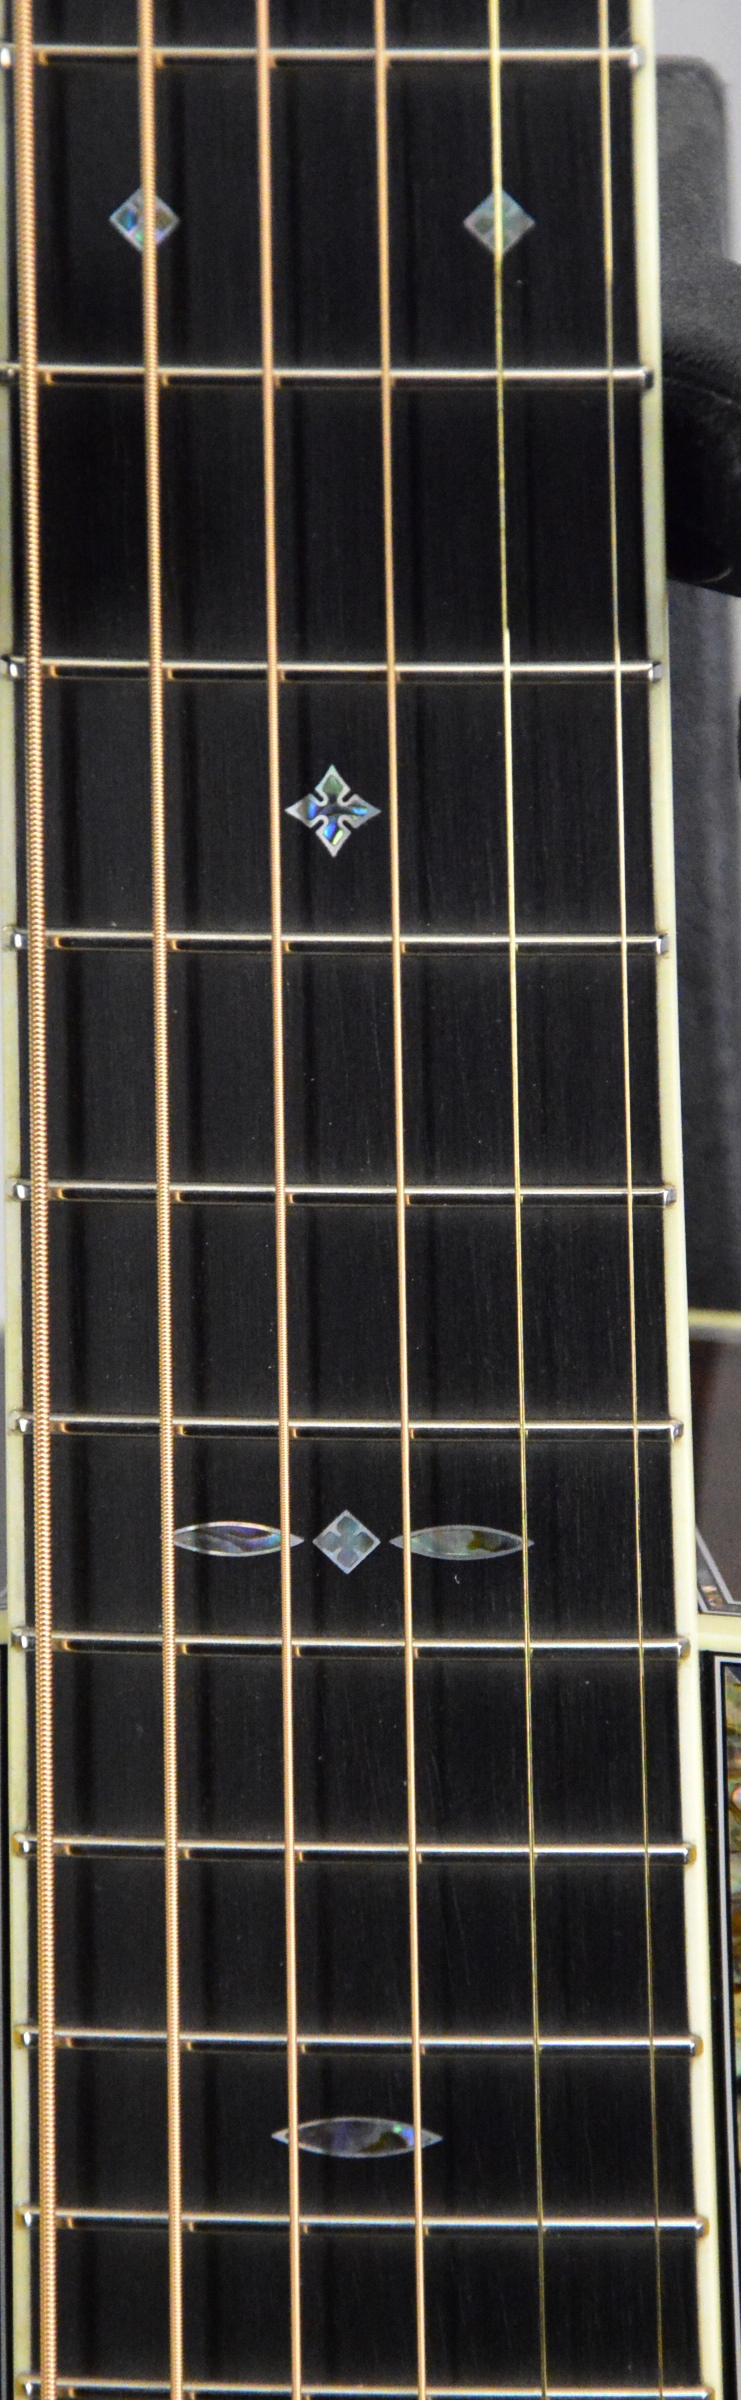 Q-2398924 S-1830638 00012 Honduran Carp (5).JPG